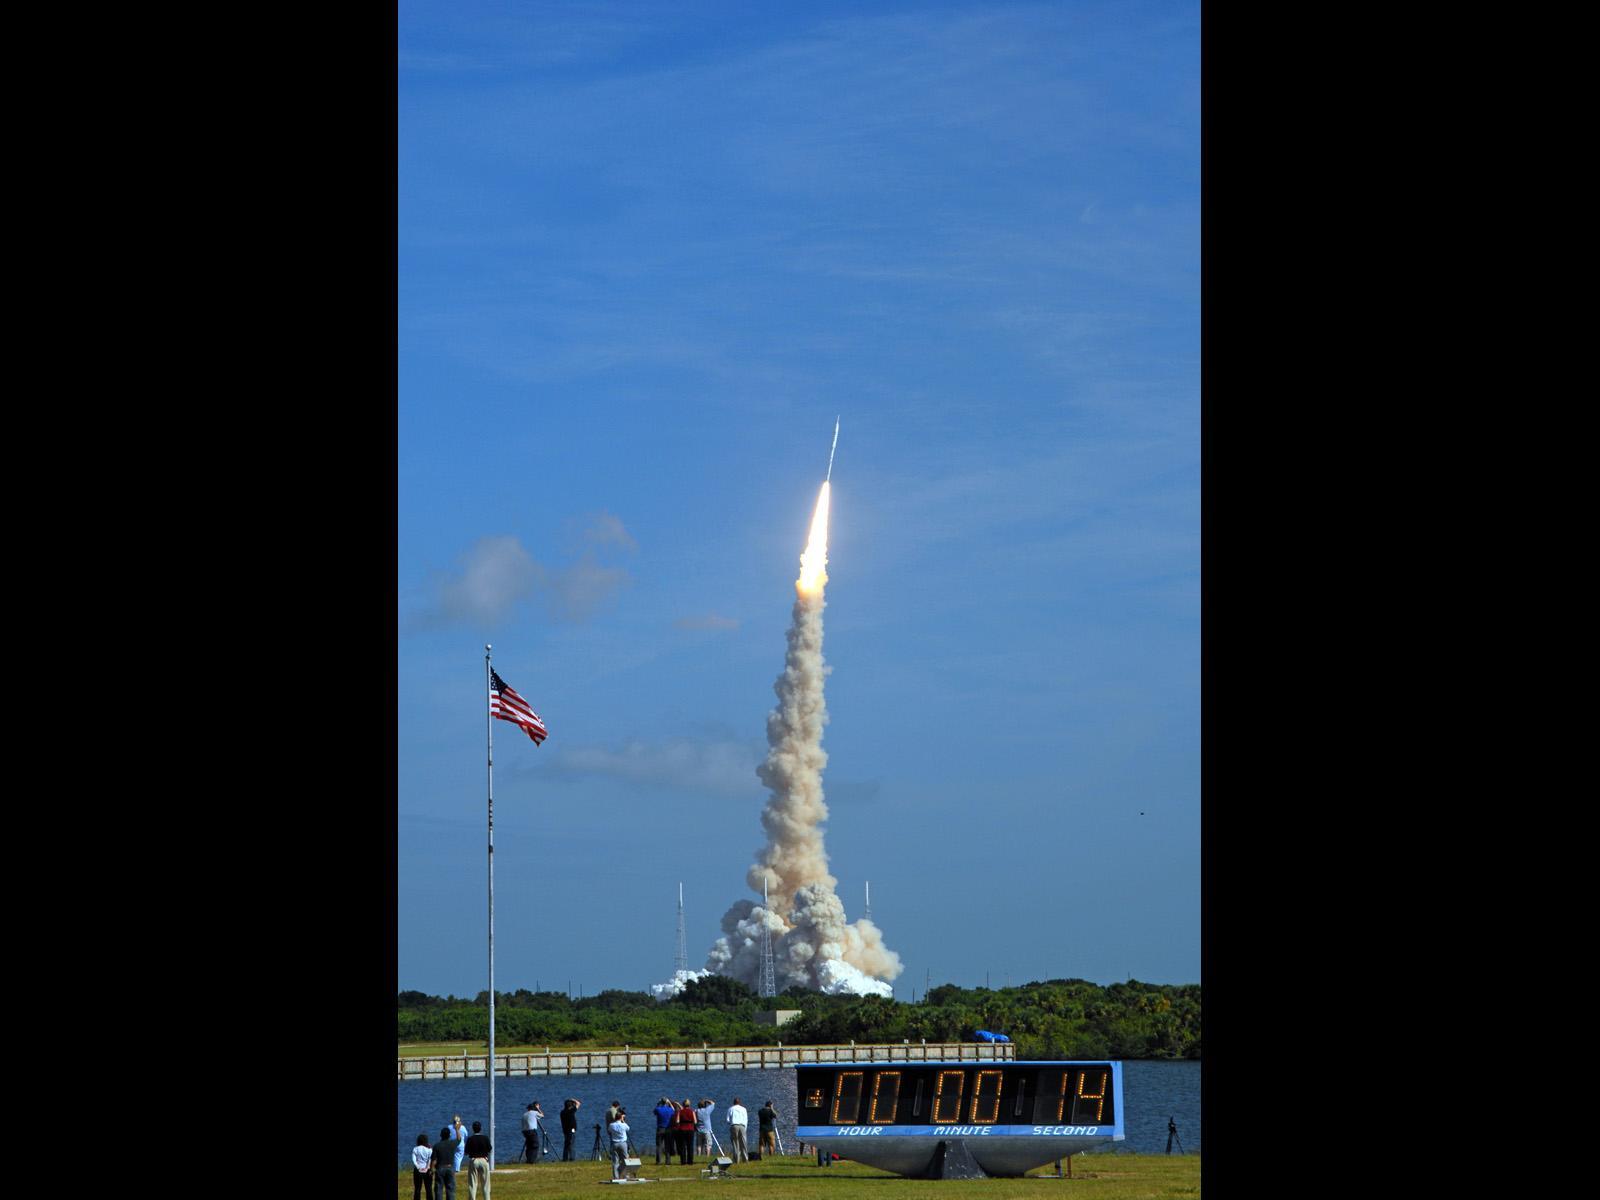 space shuttle launch simulator online - photo #30